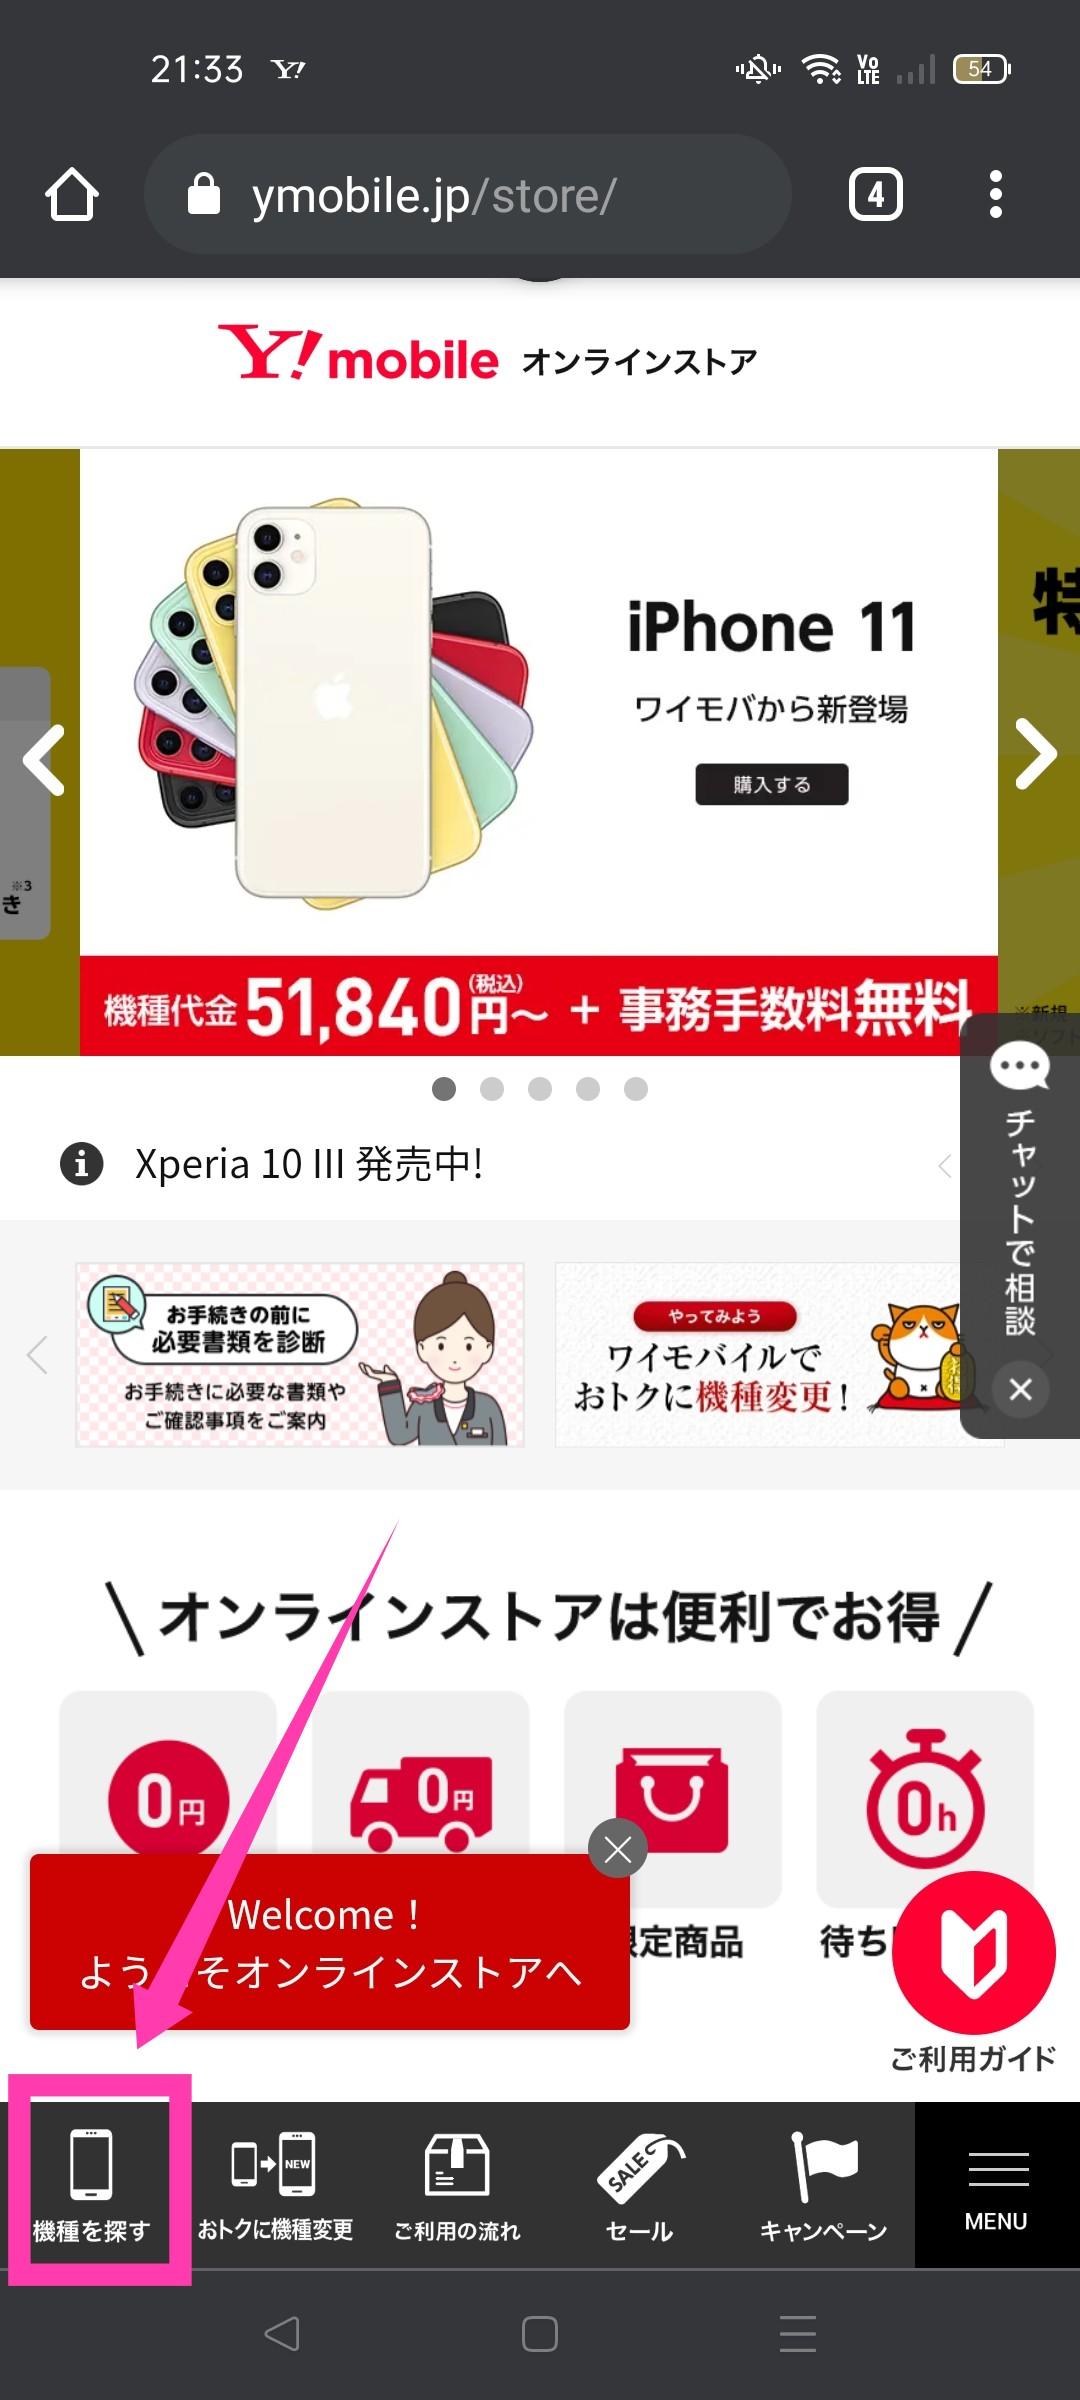 Y!mobileでiPhone 11を購入する手順画像1